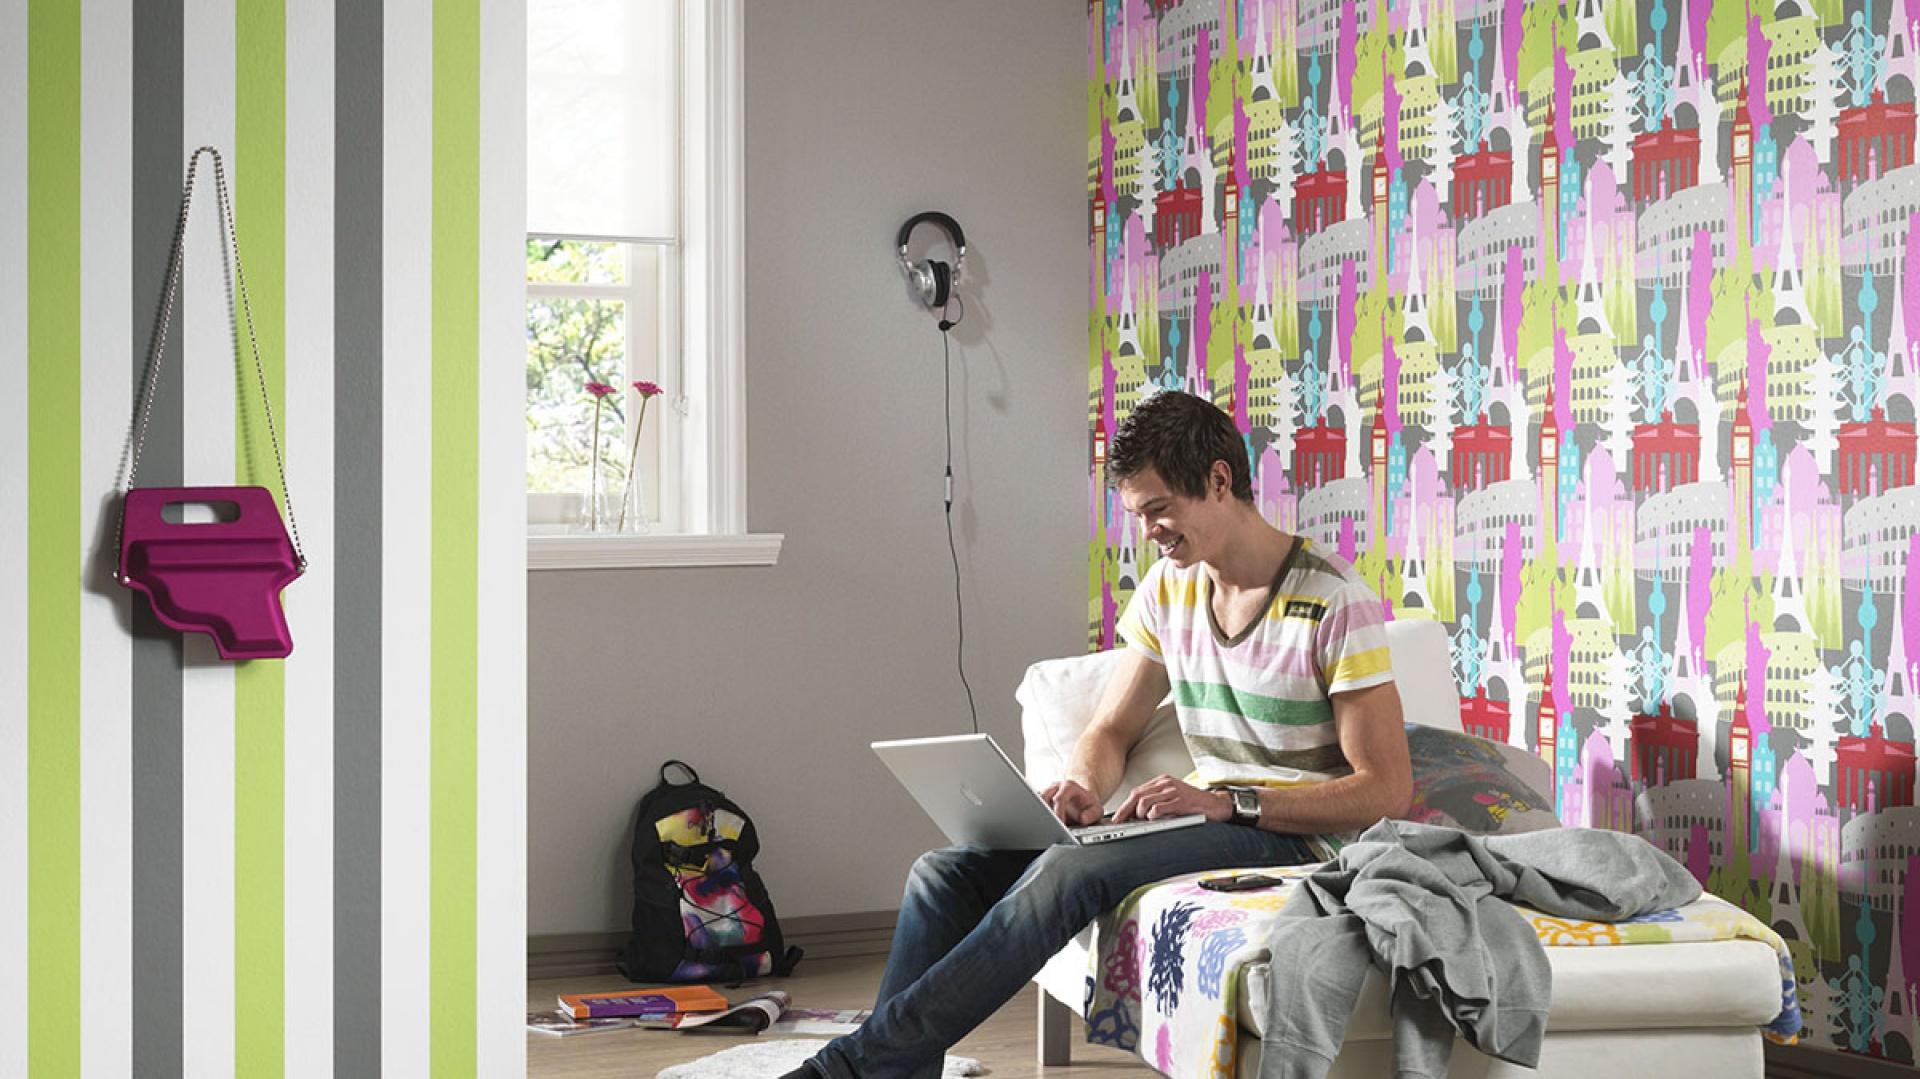 Fot. Okazje.info